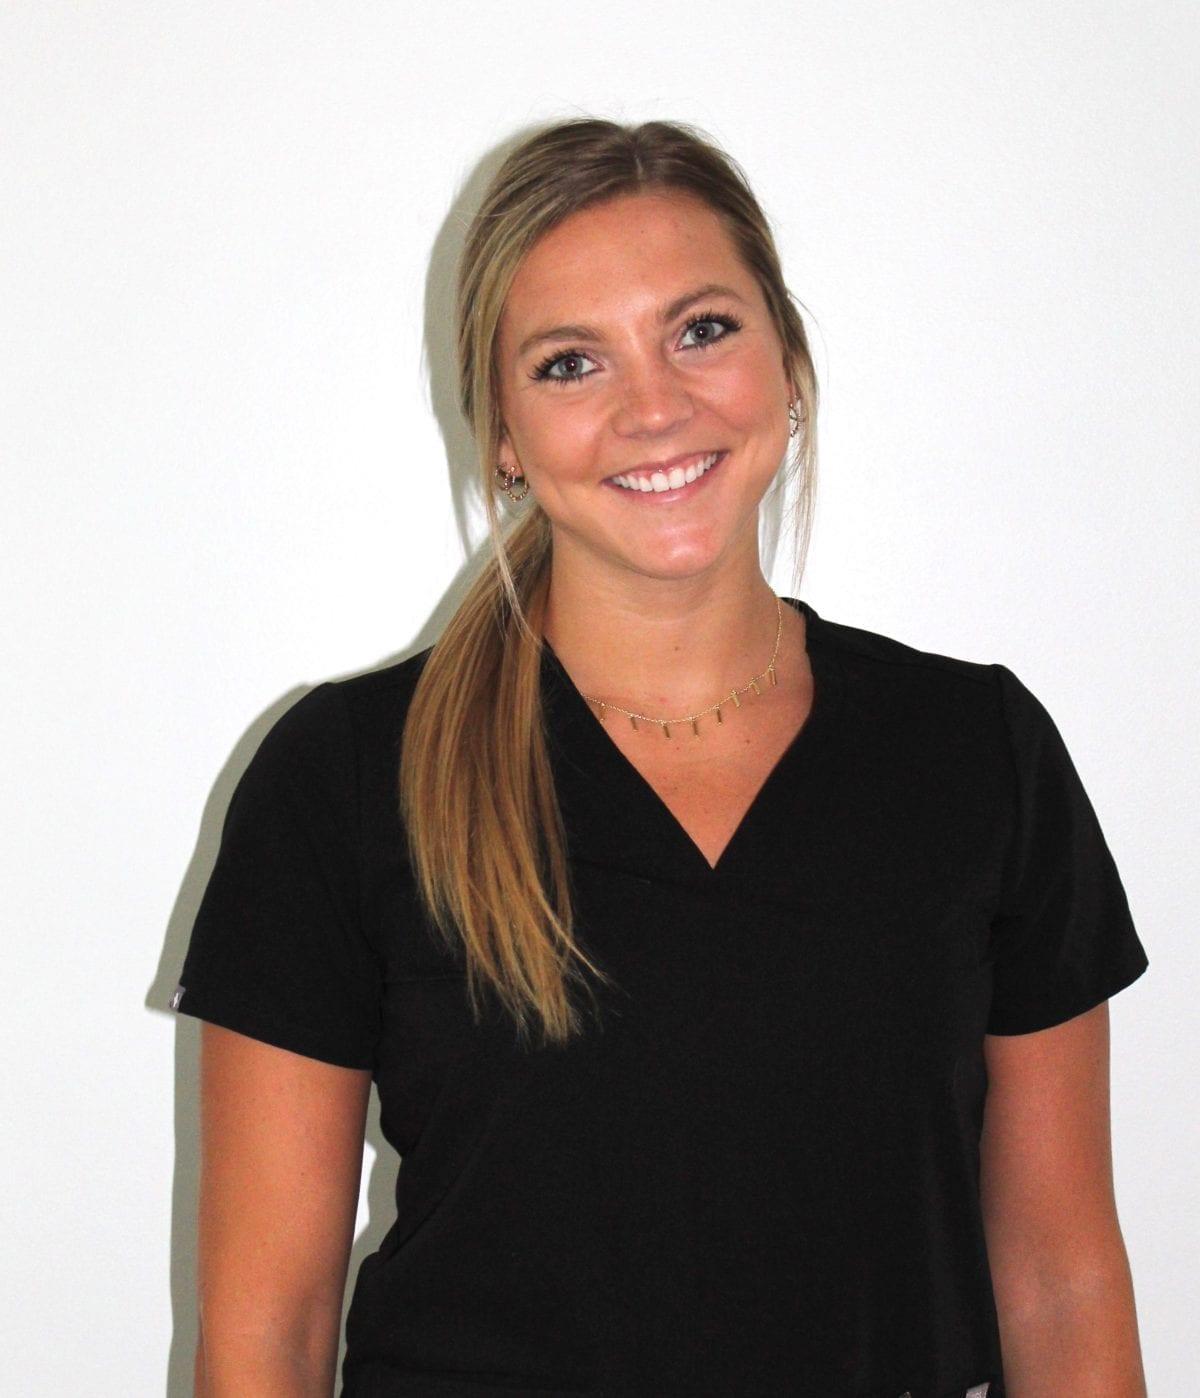 Danielle Oeverman